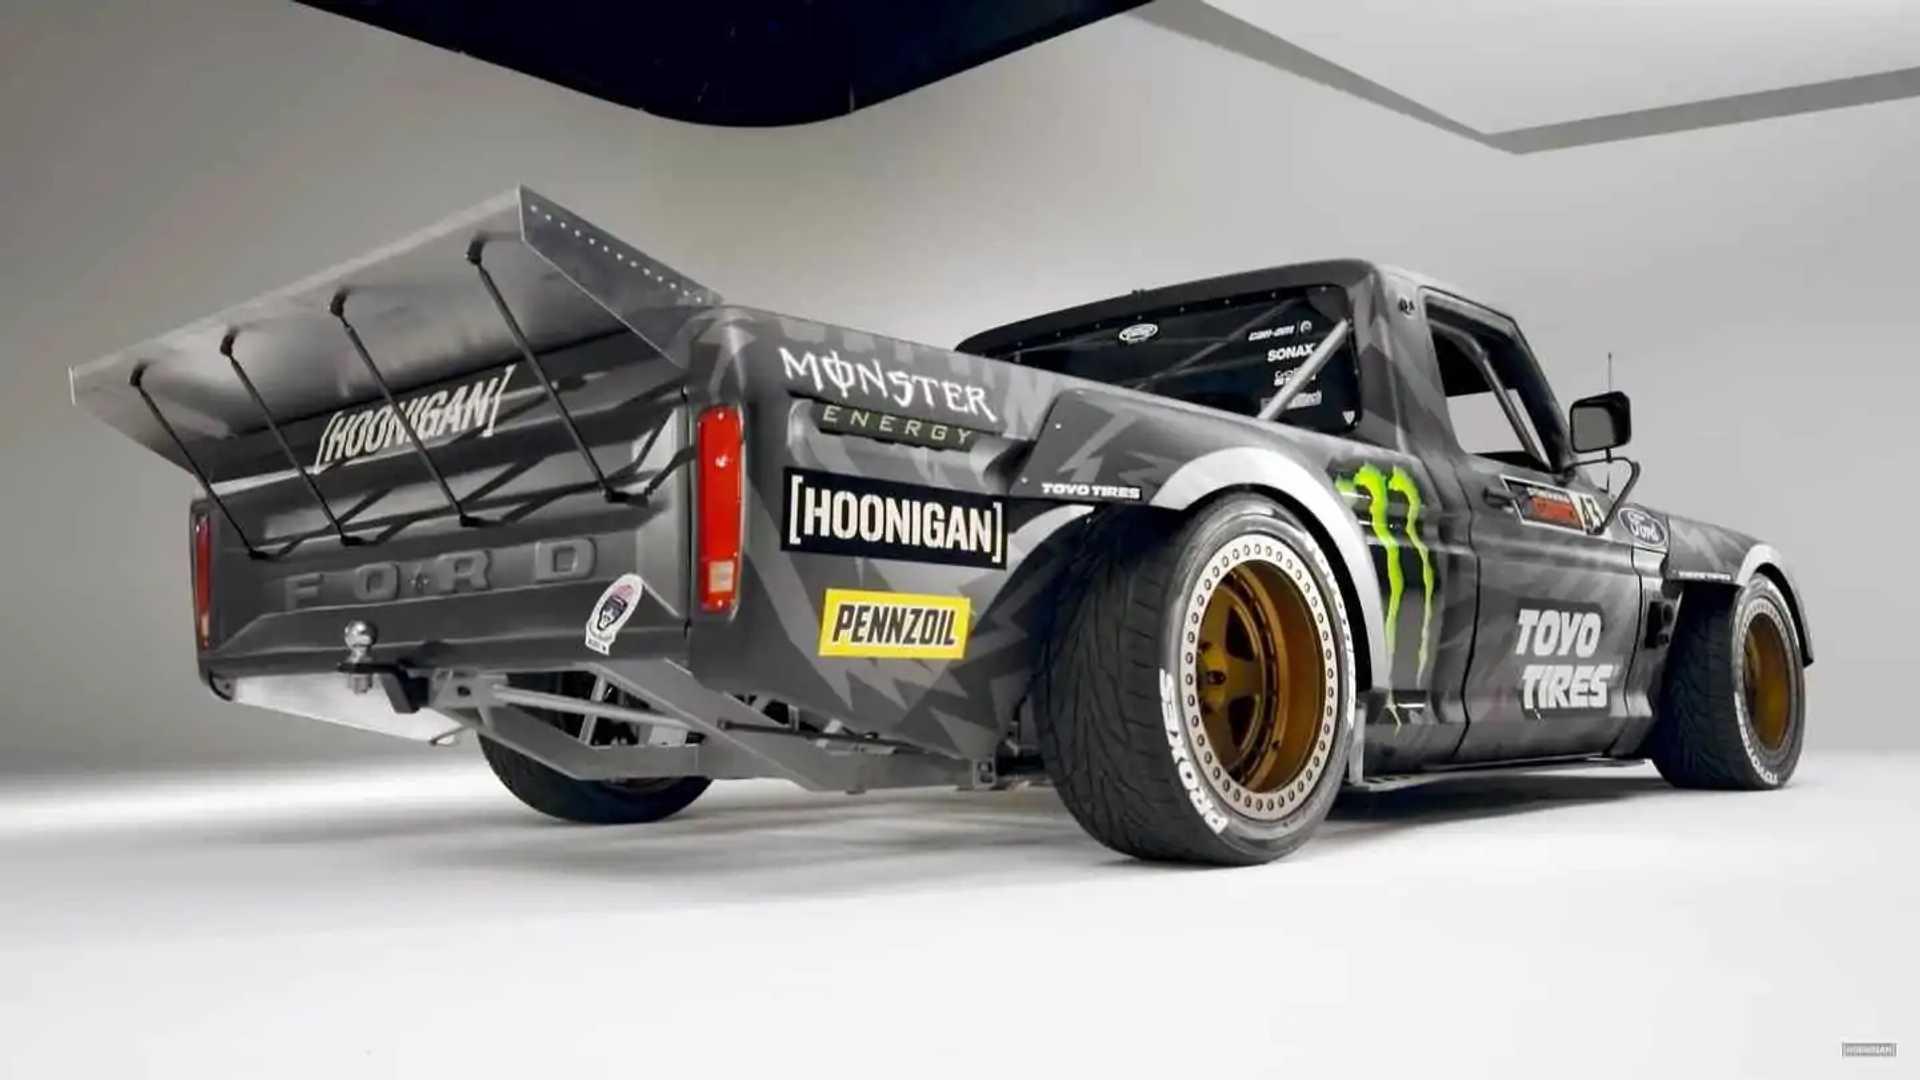 Ken Block Hoonigan Mustang Rc